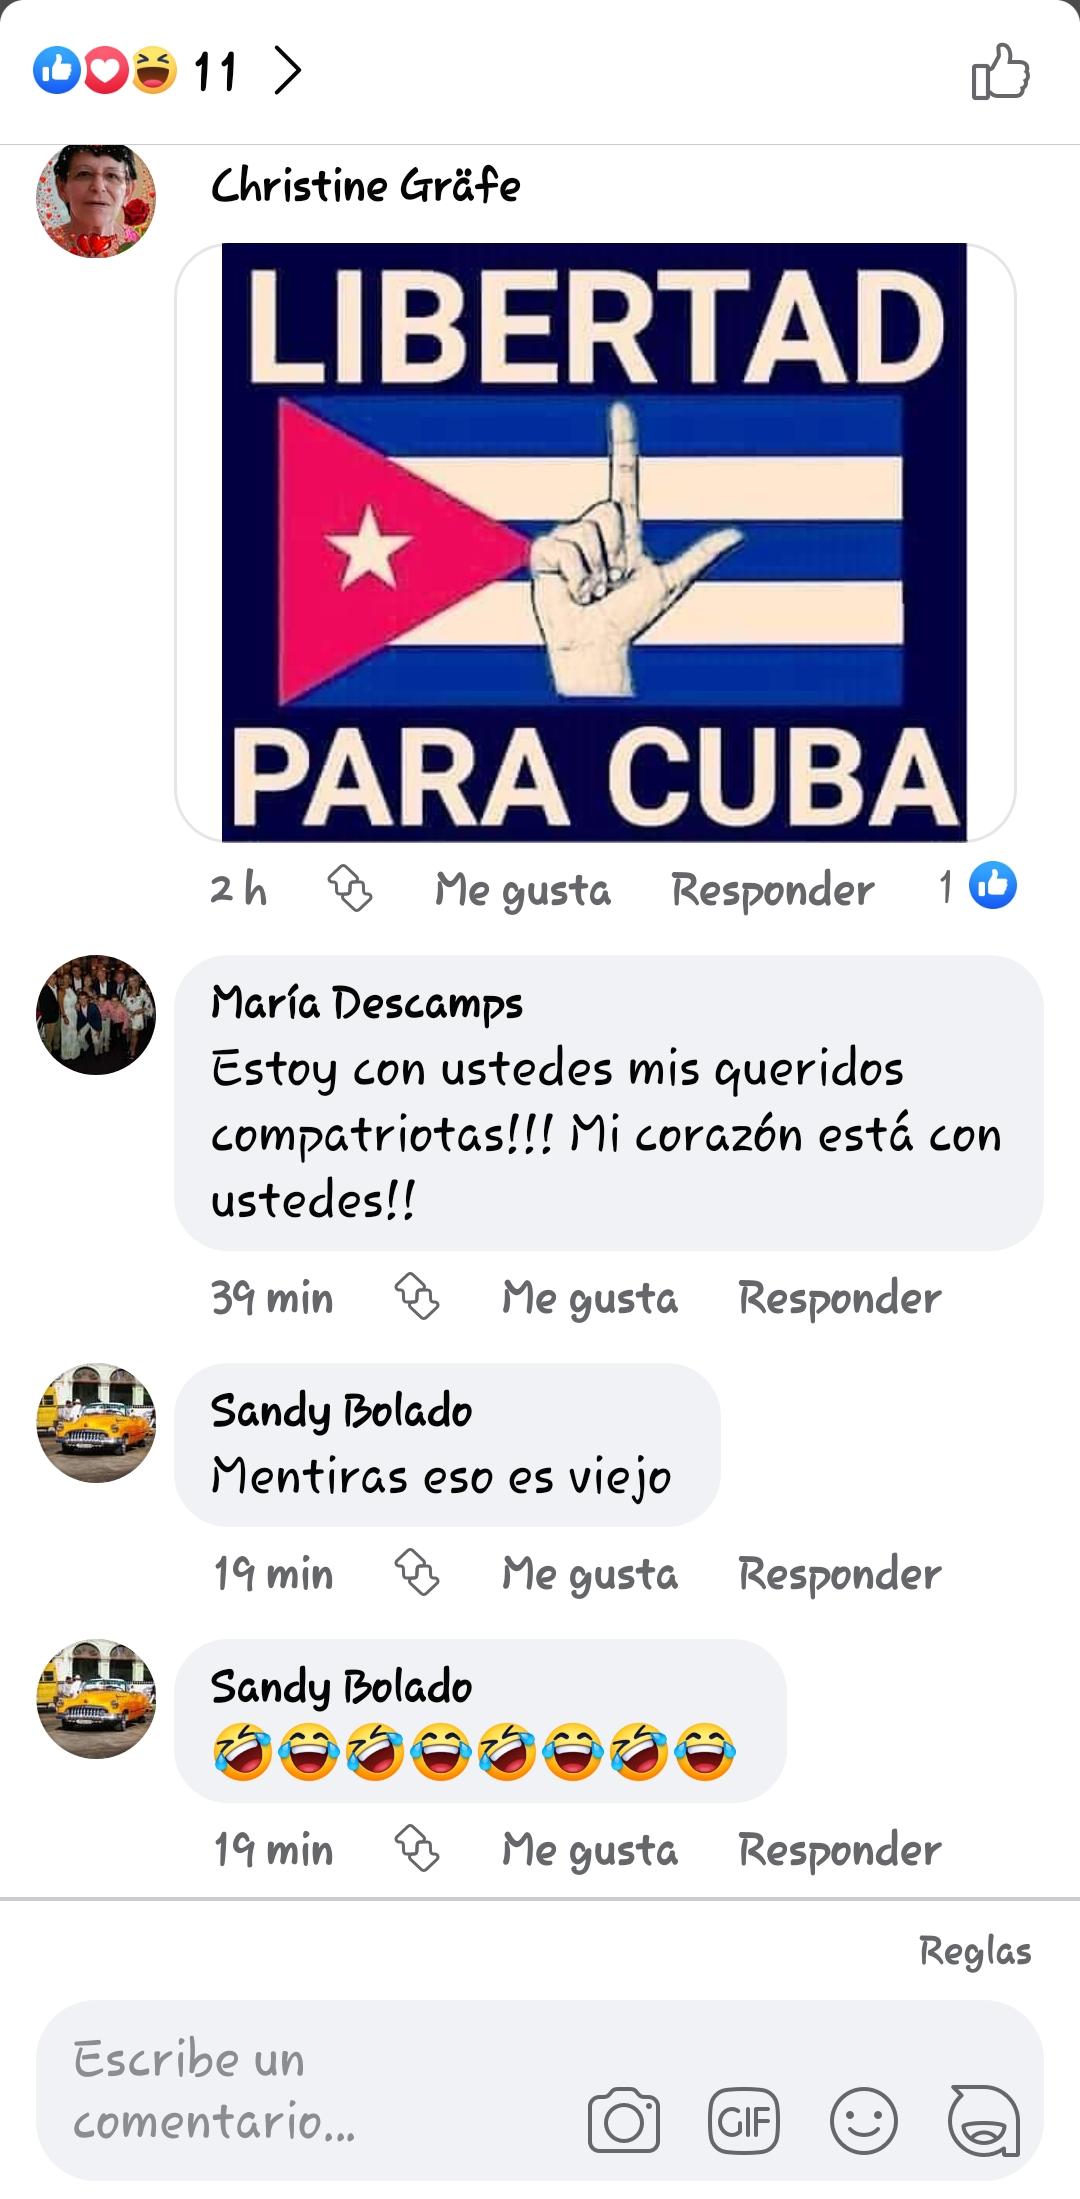 Sandy Bolado